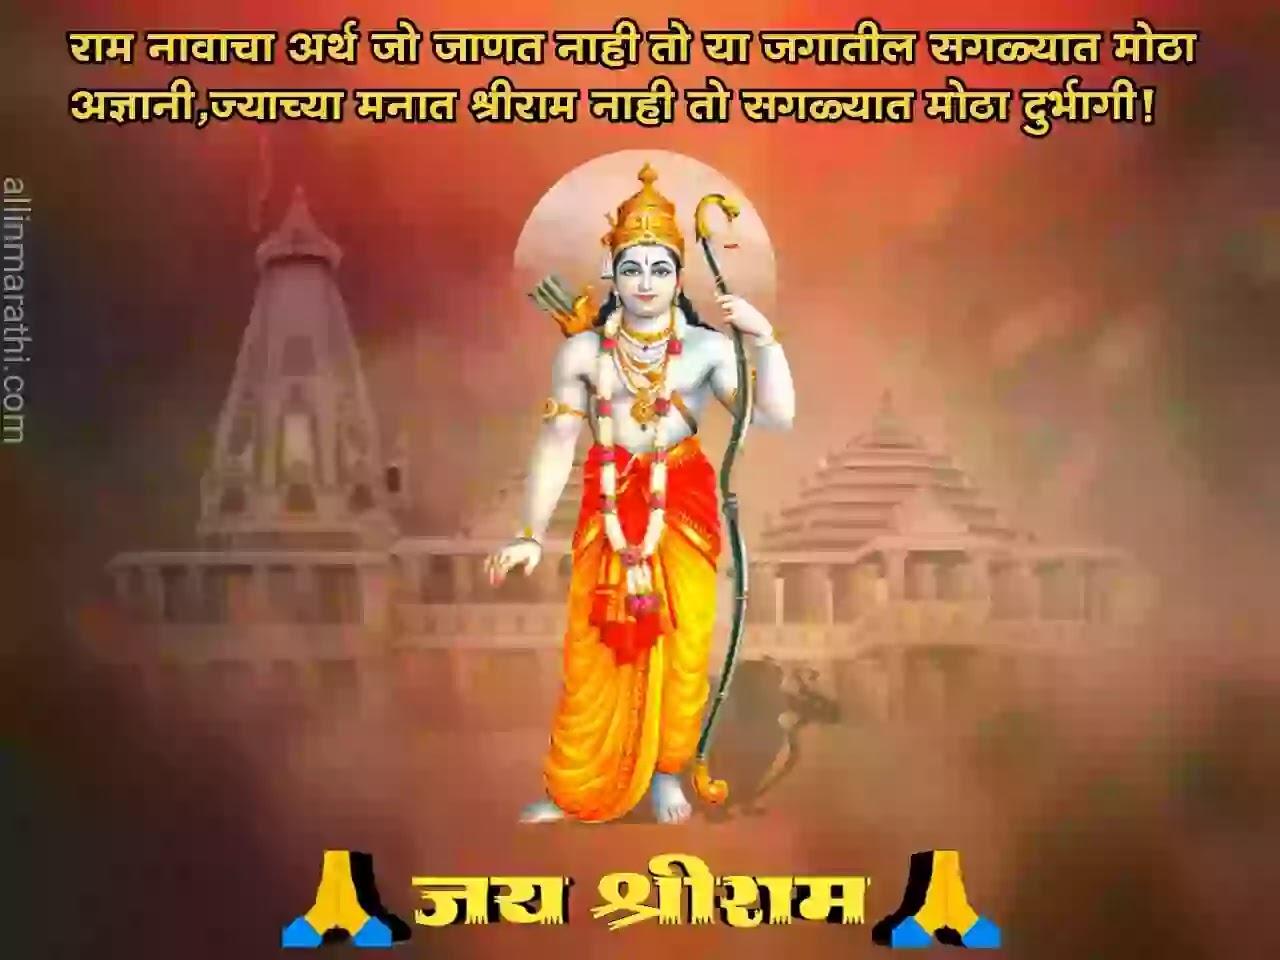 Shree-Ram-status-marathi